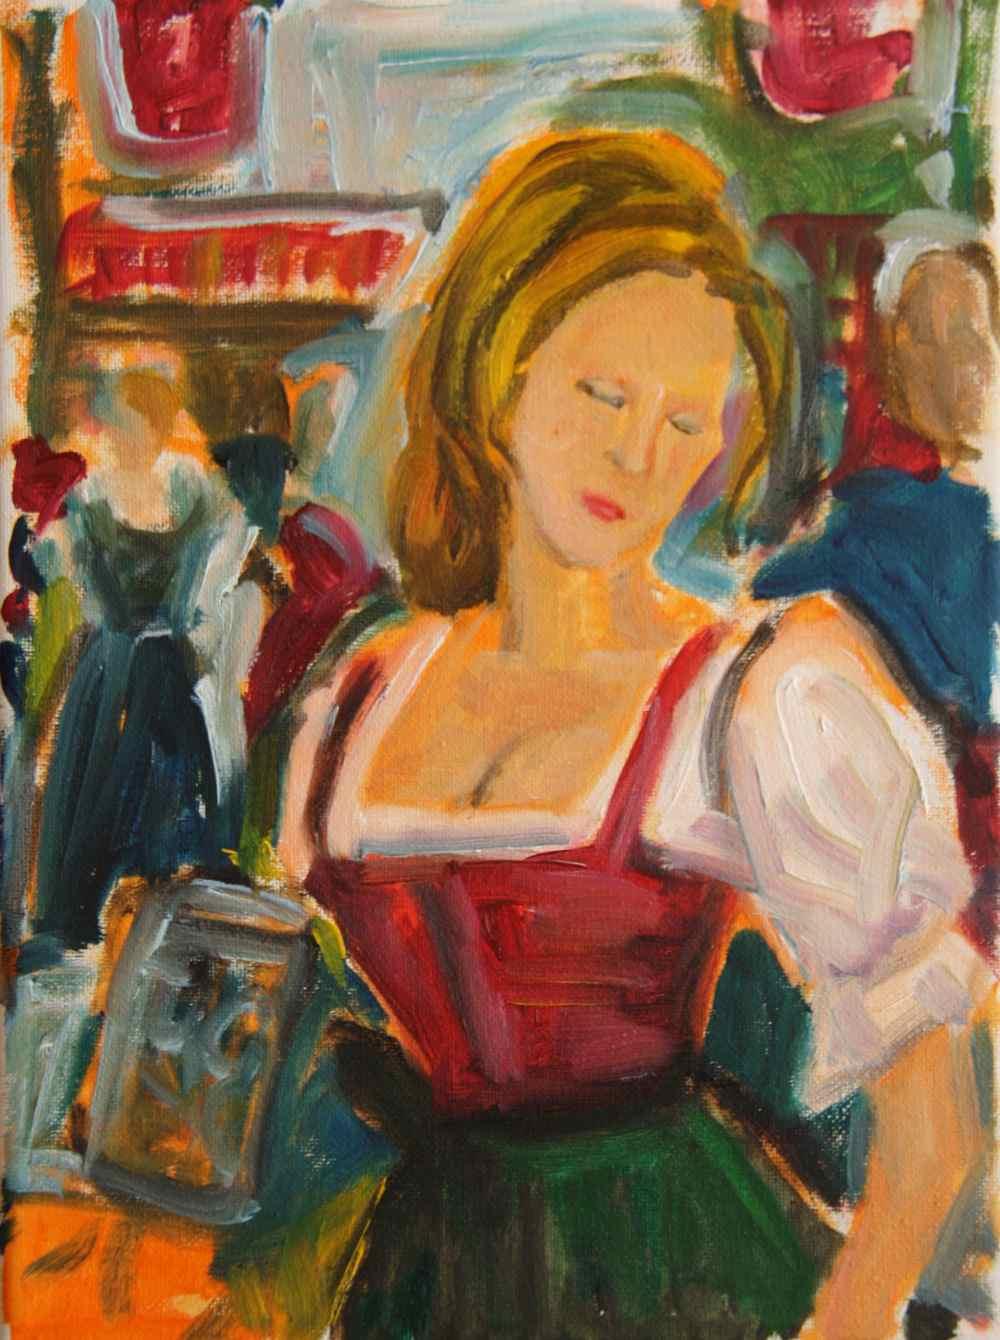 Oktoberfest Dirndl Study - original oil painting